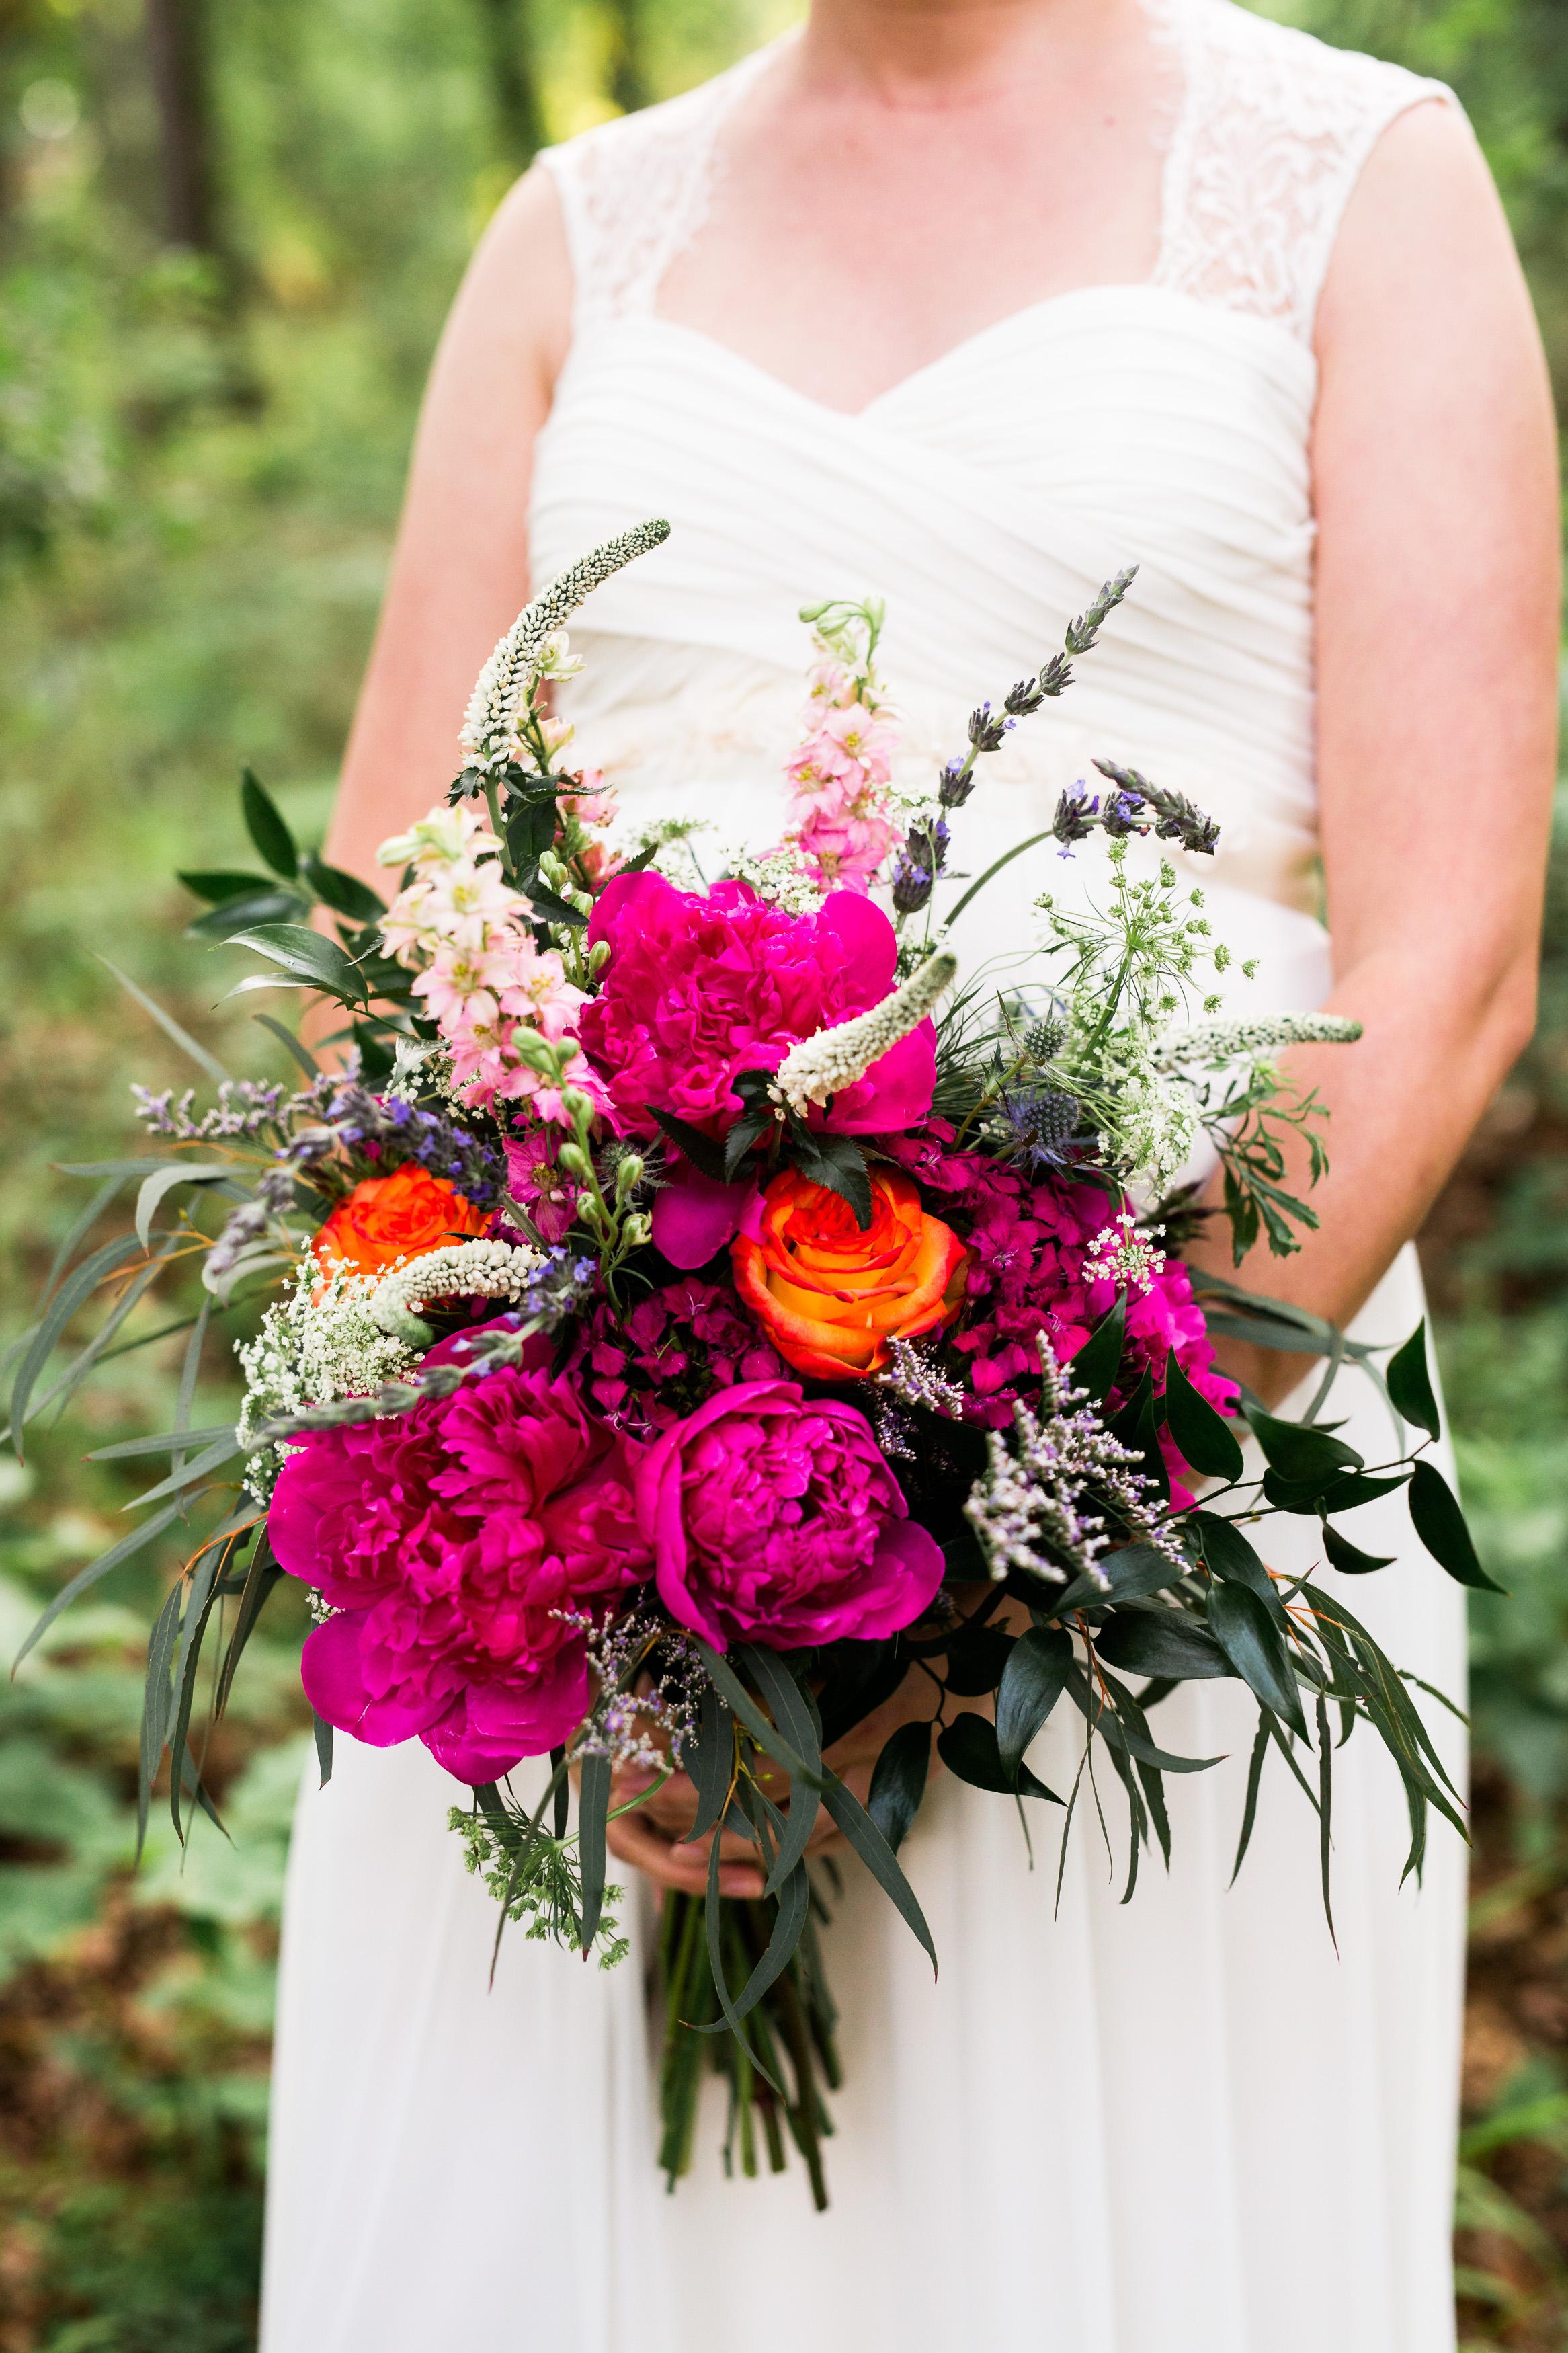 oklahoma wedding southeastern oklahoma saris colors diy nature norman wedding photography beavers bend mccurtain county decor big pink bouquet peonies roses